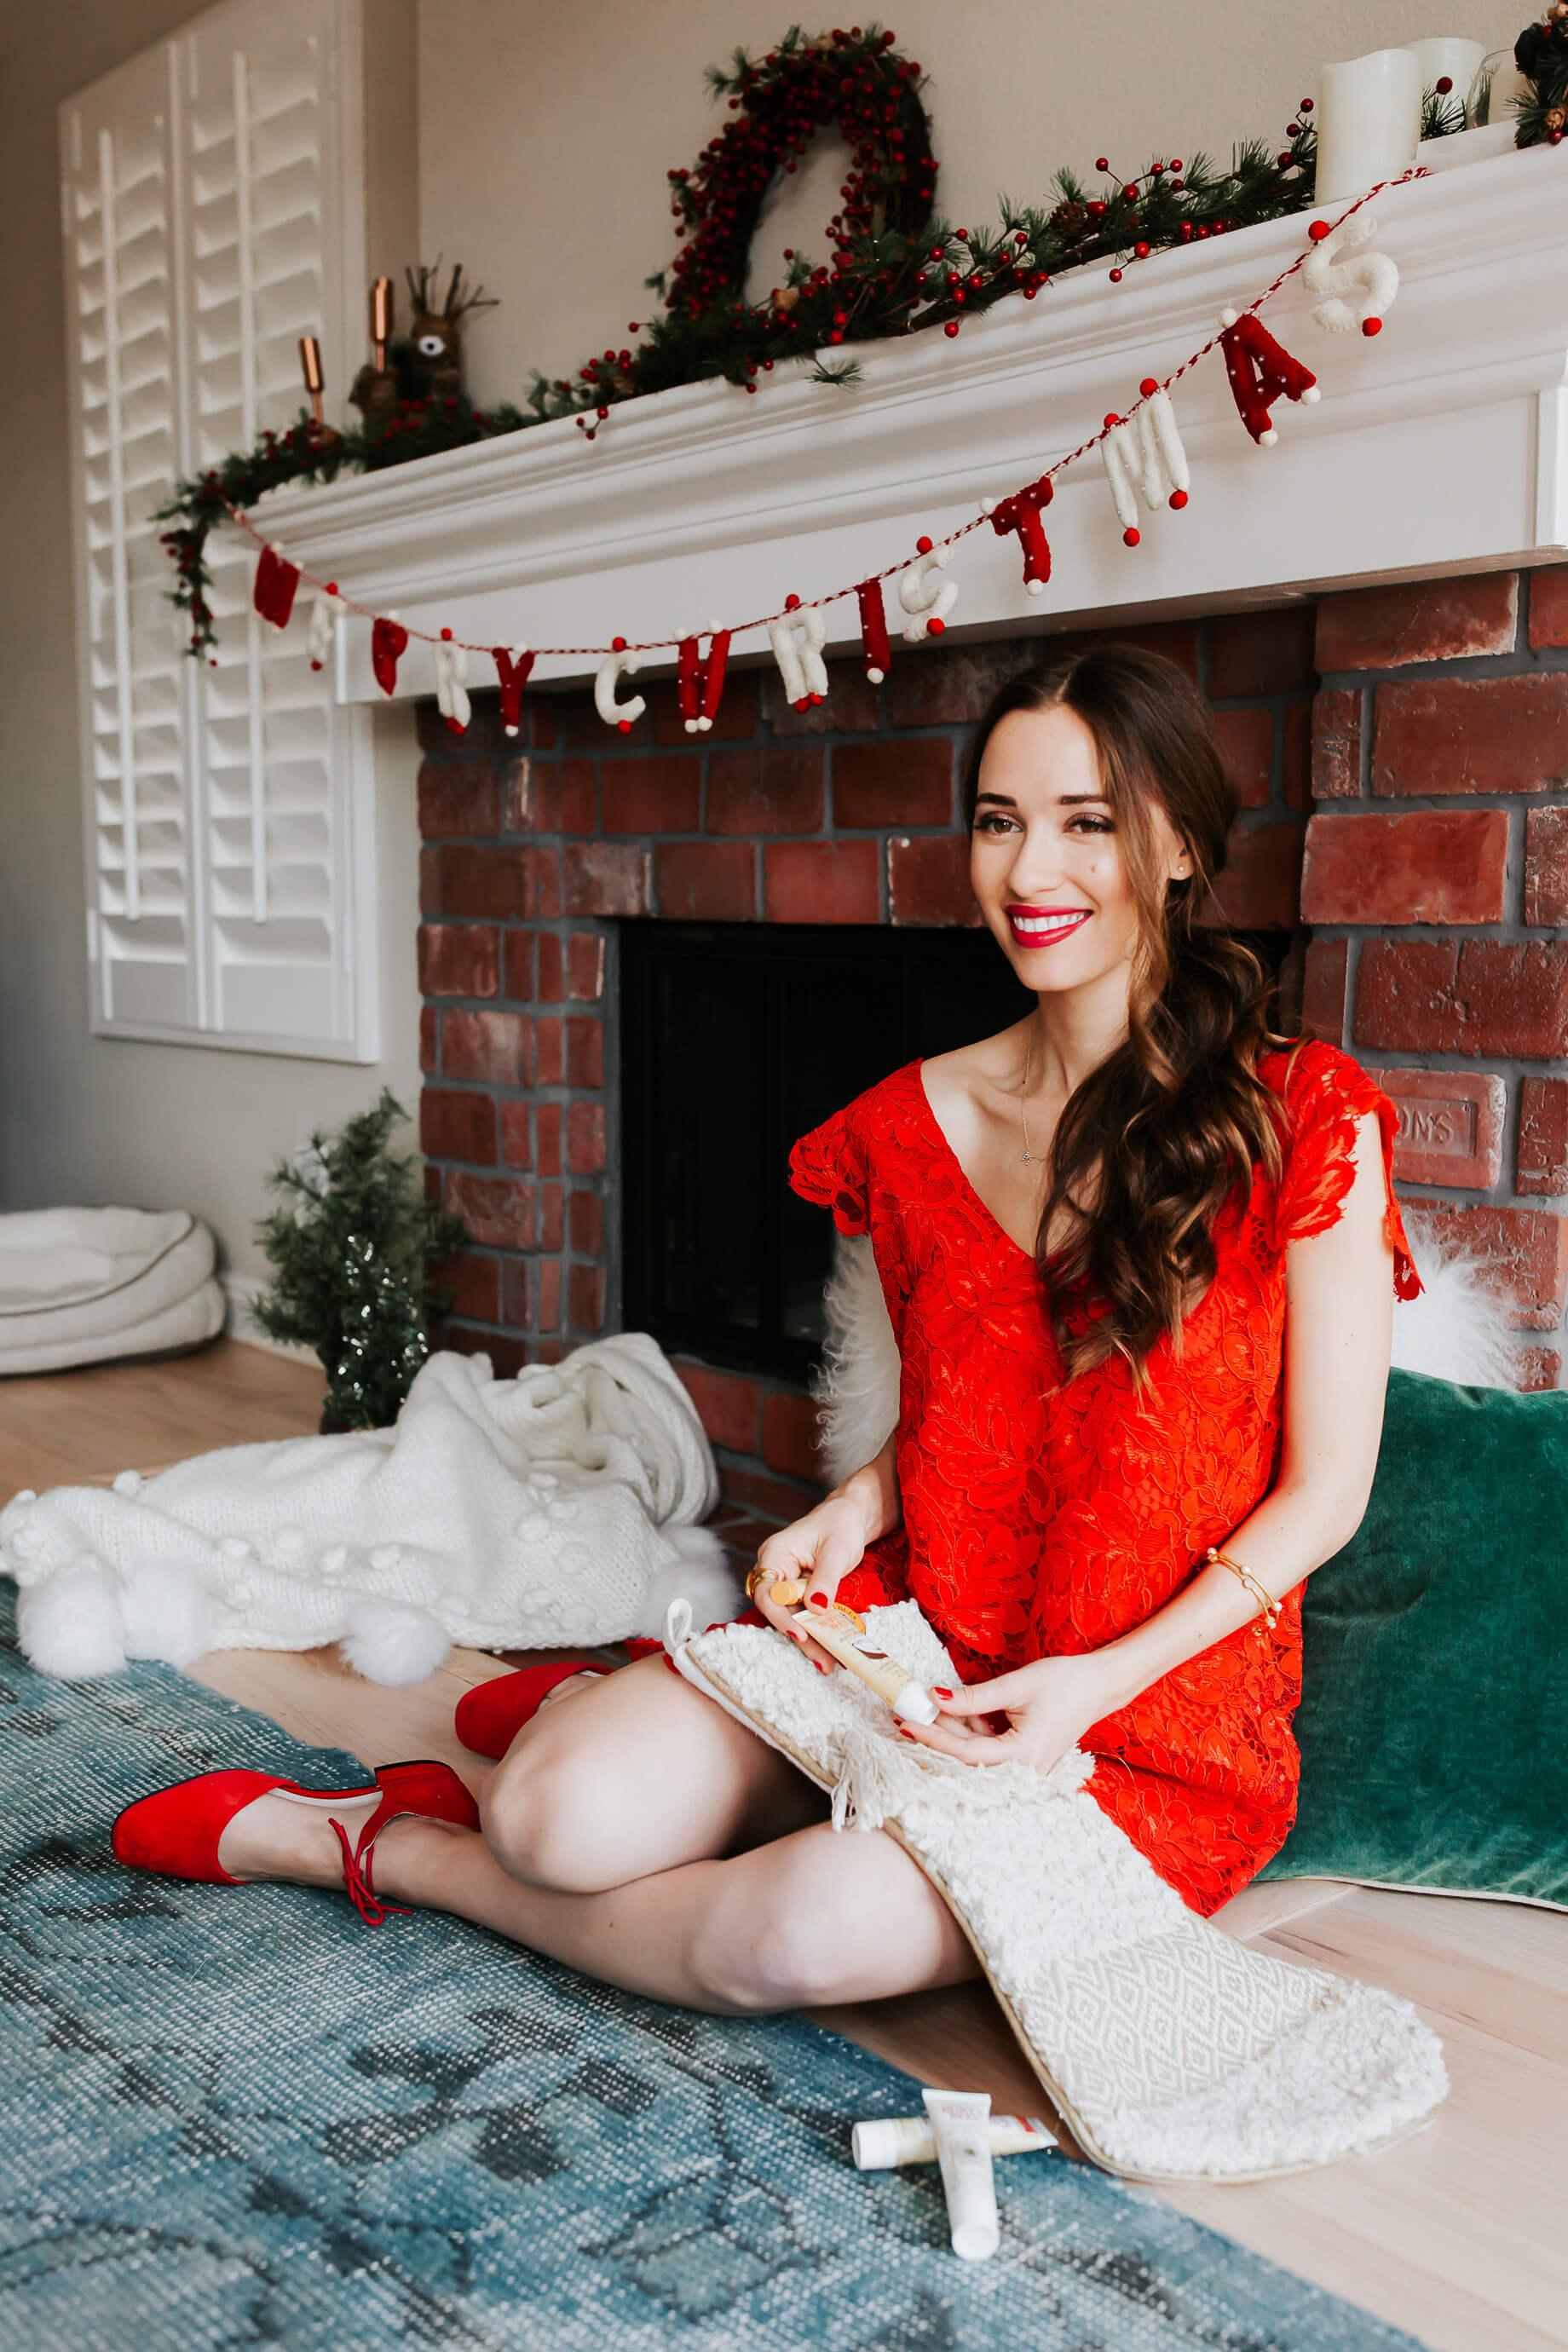 Perfect stocking pics